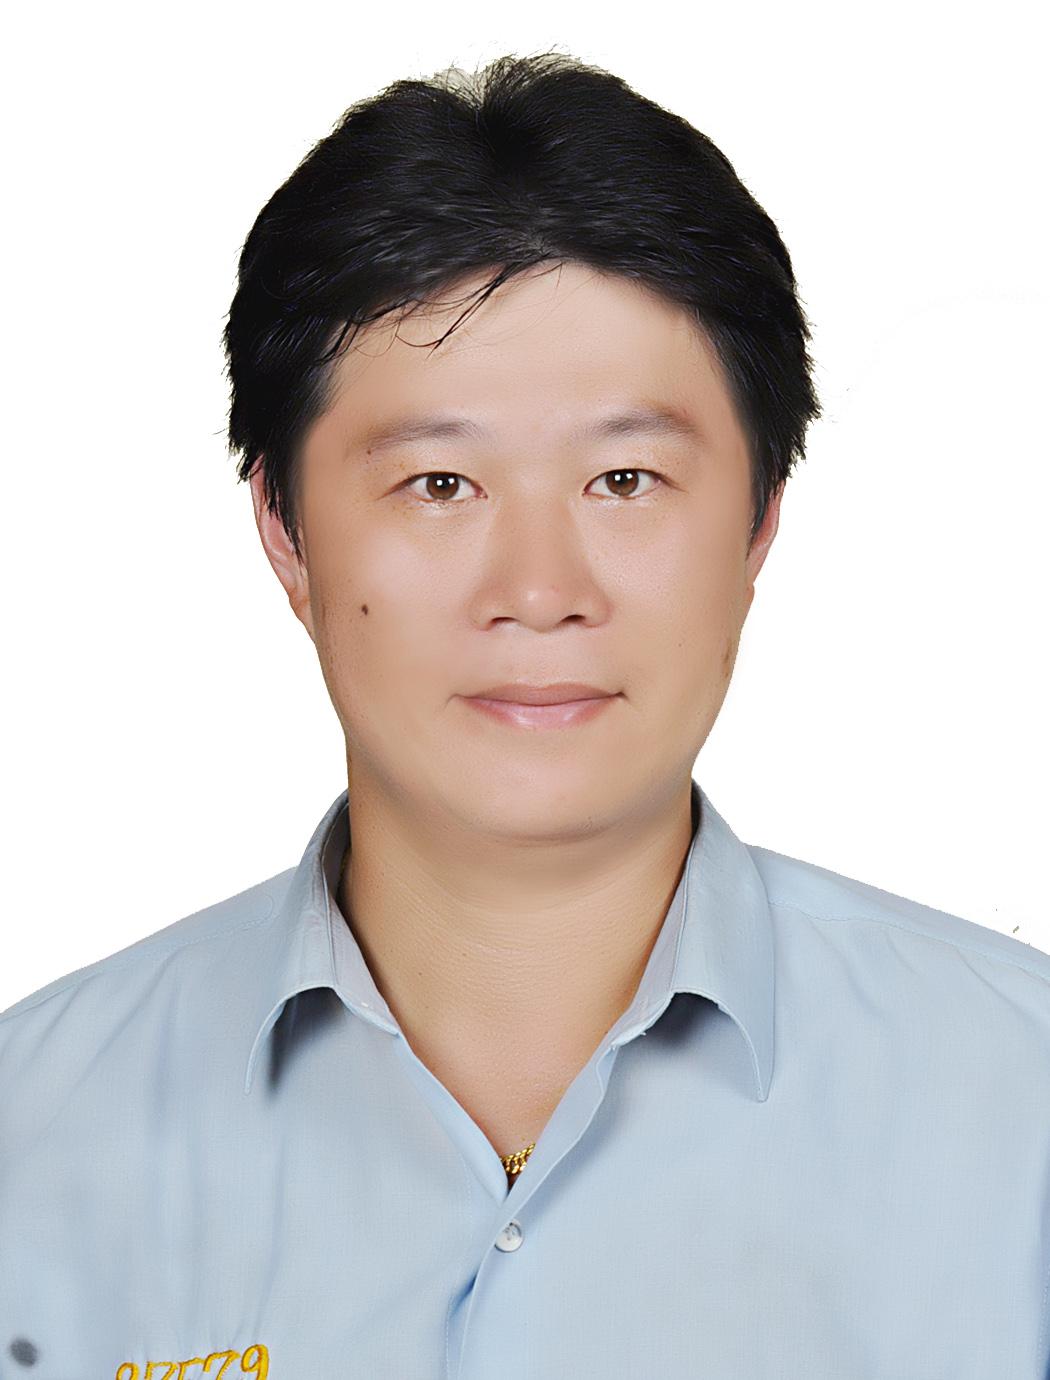 Mr. Gary Sung